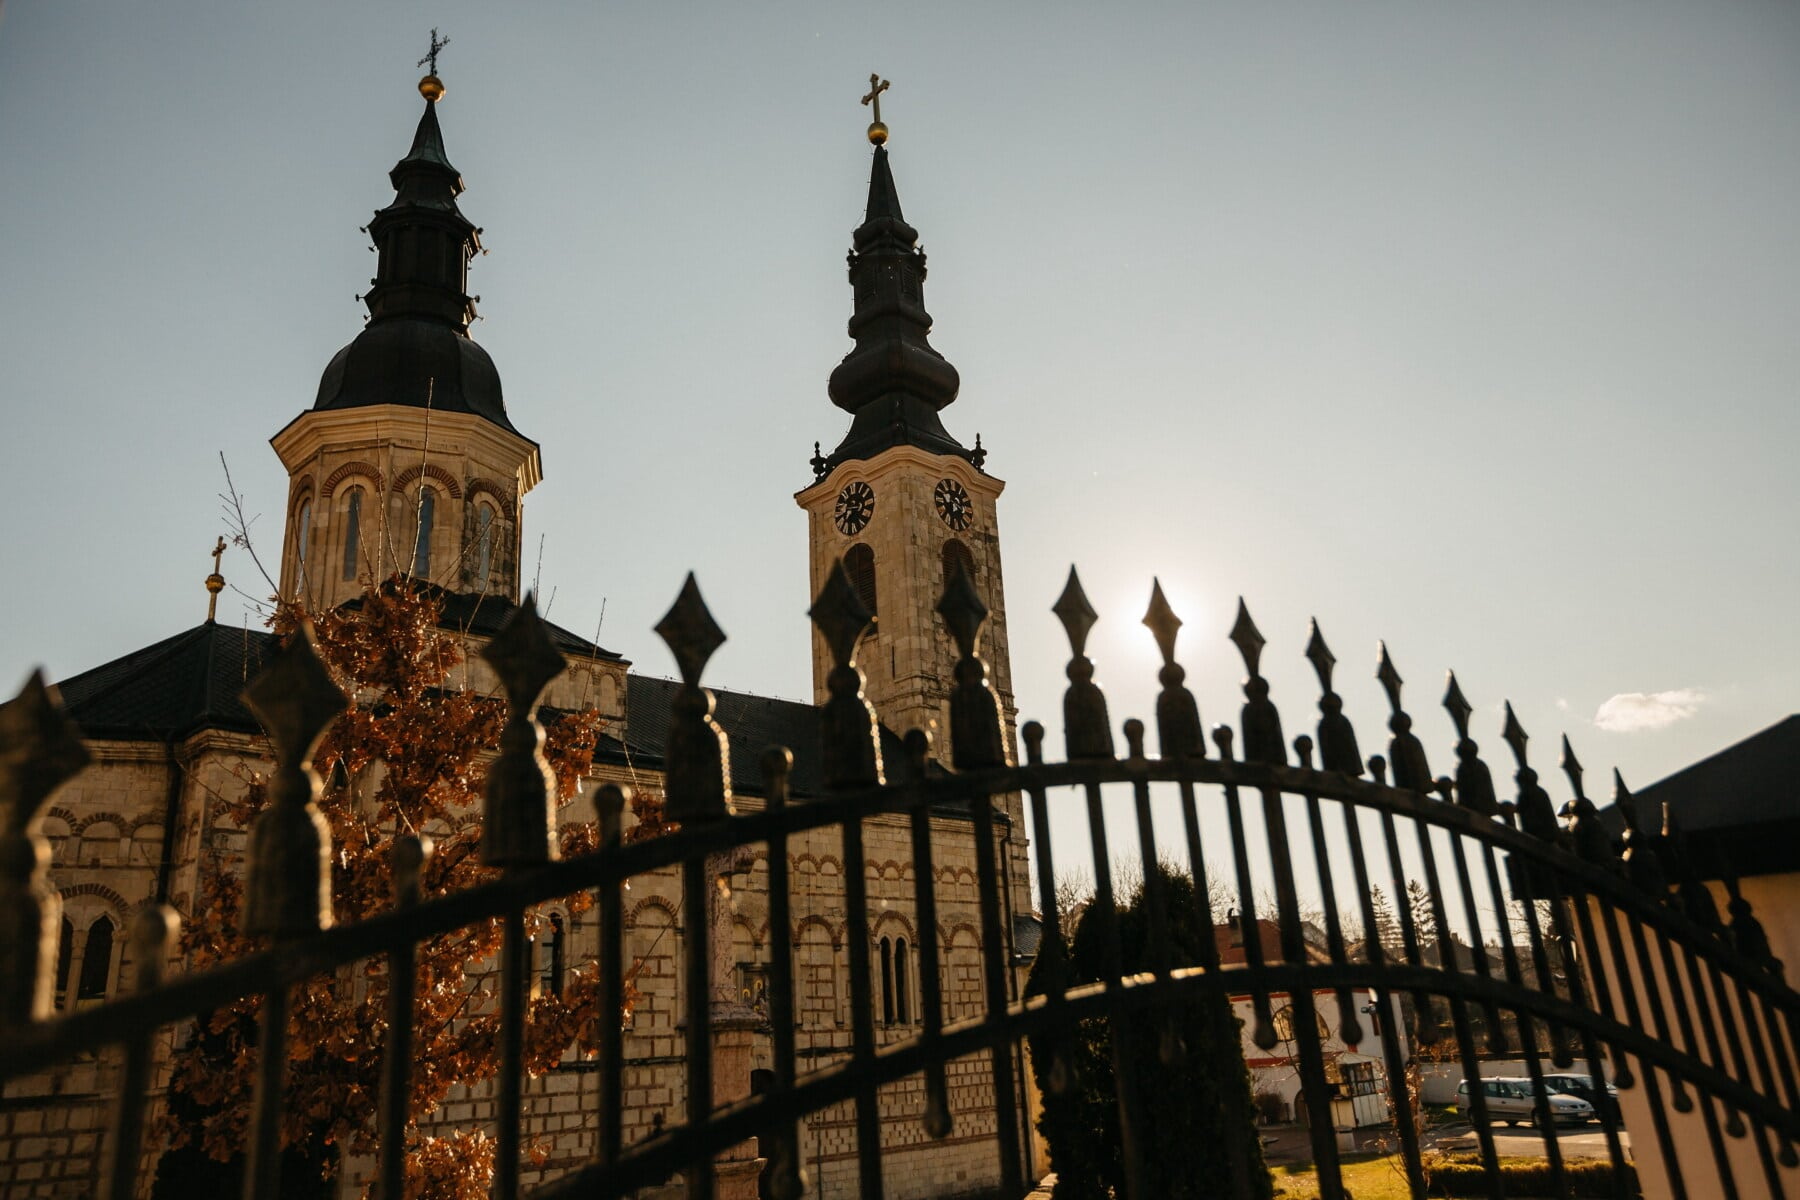 church tower, cast iron, fence, gate, gateway, church, backyard, architecture, religion, palace